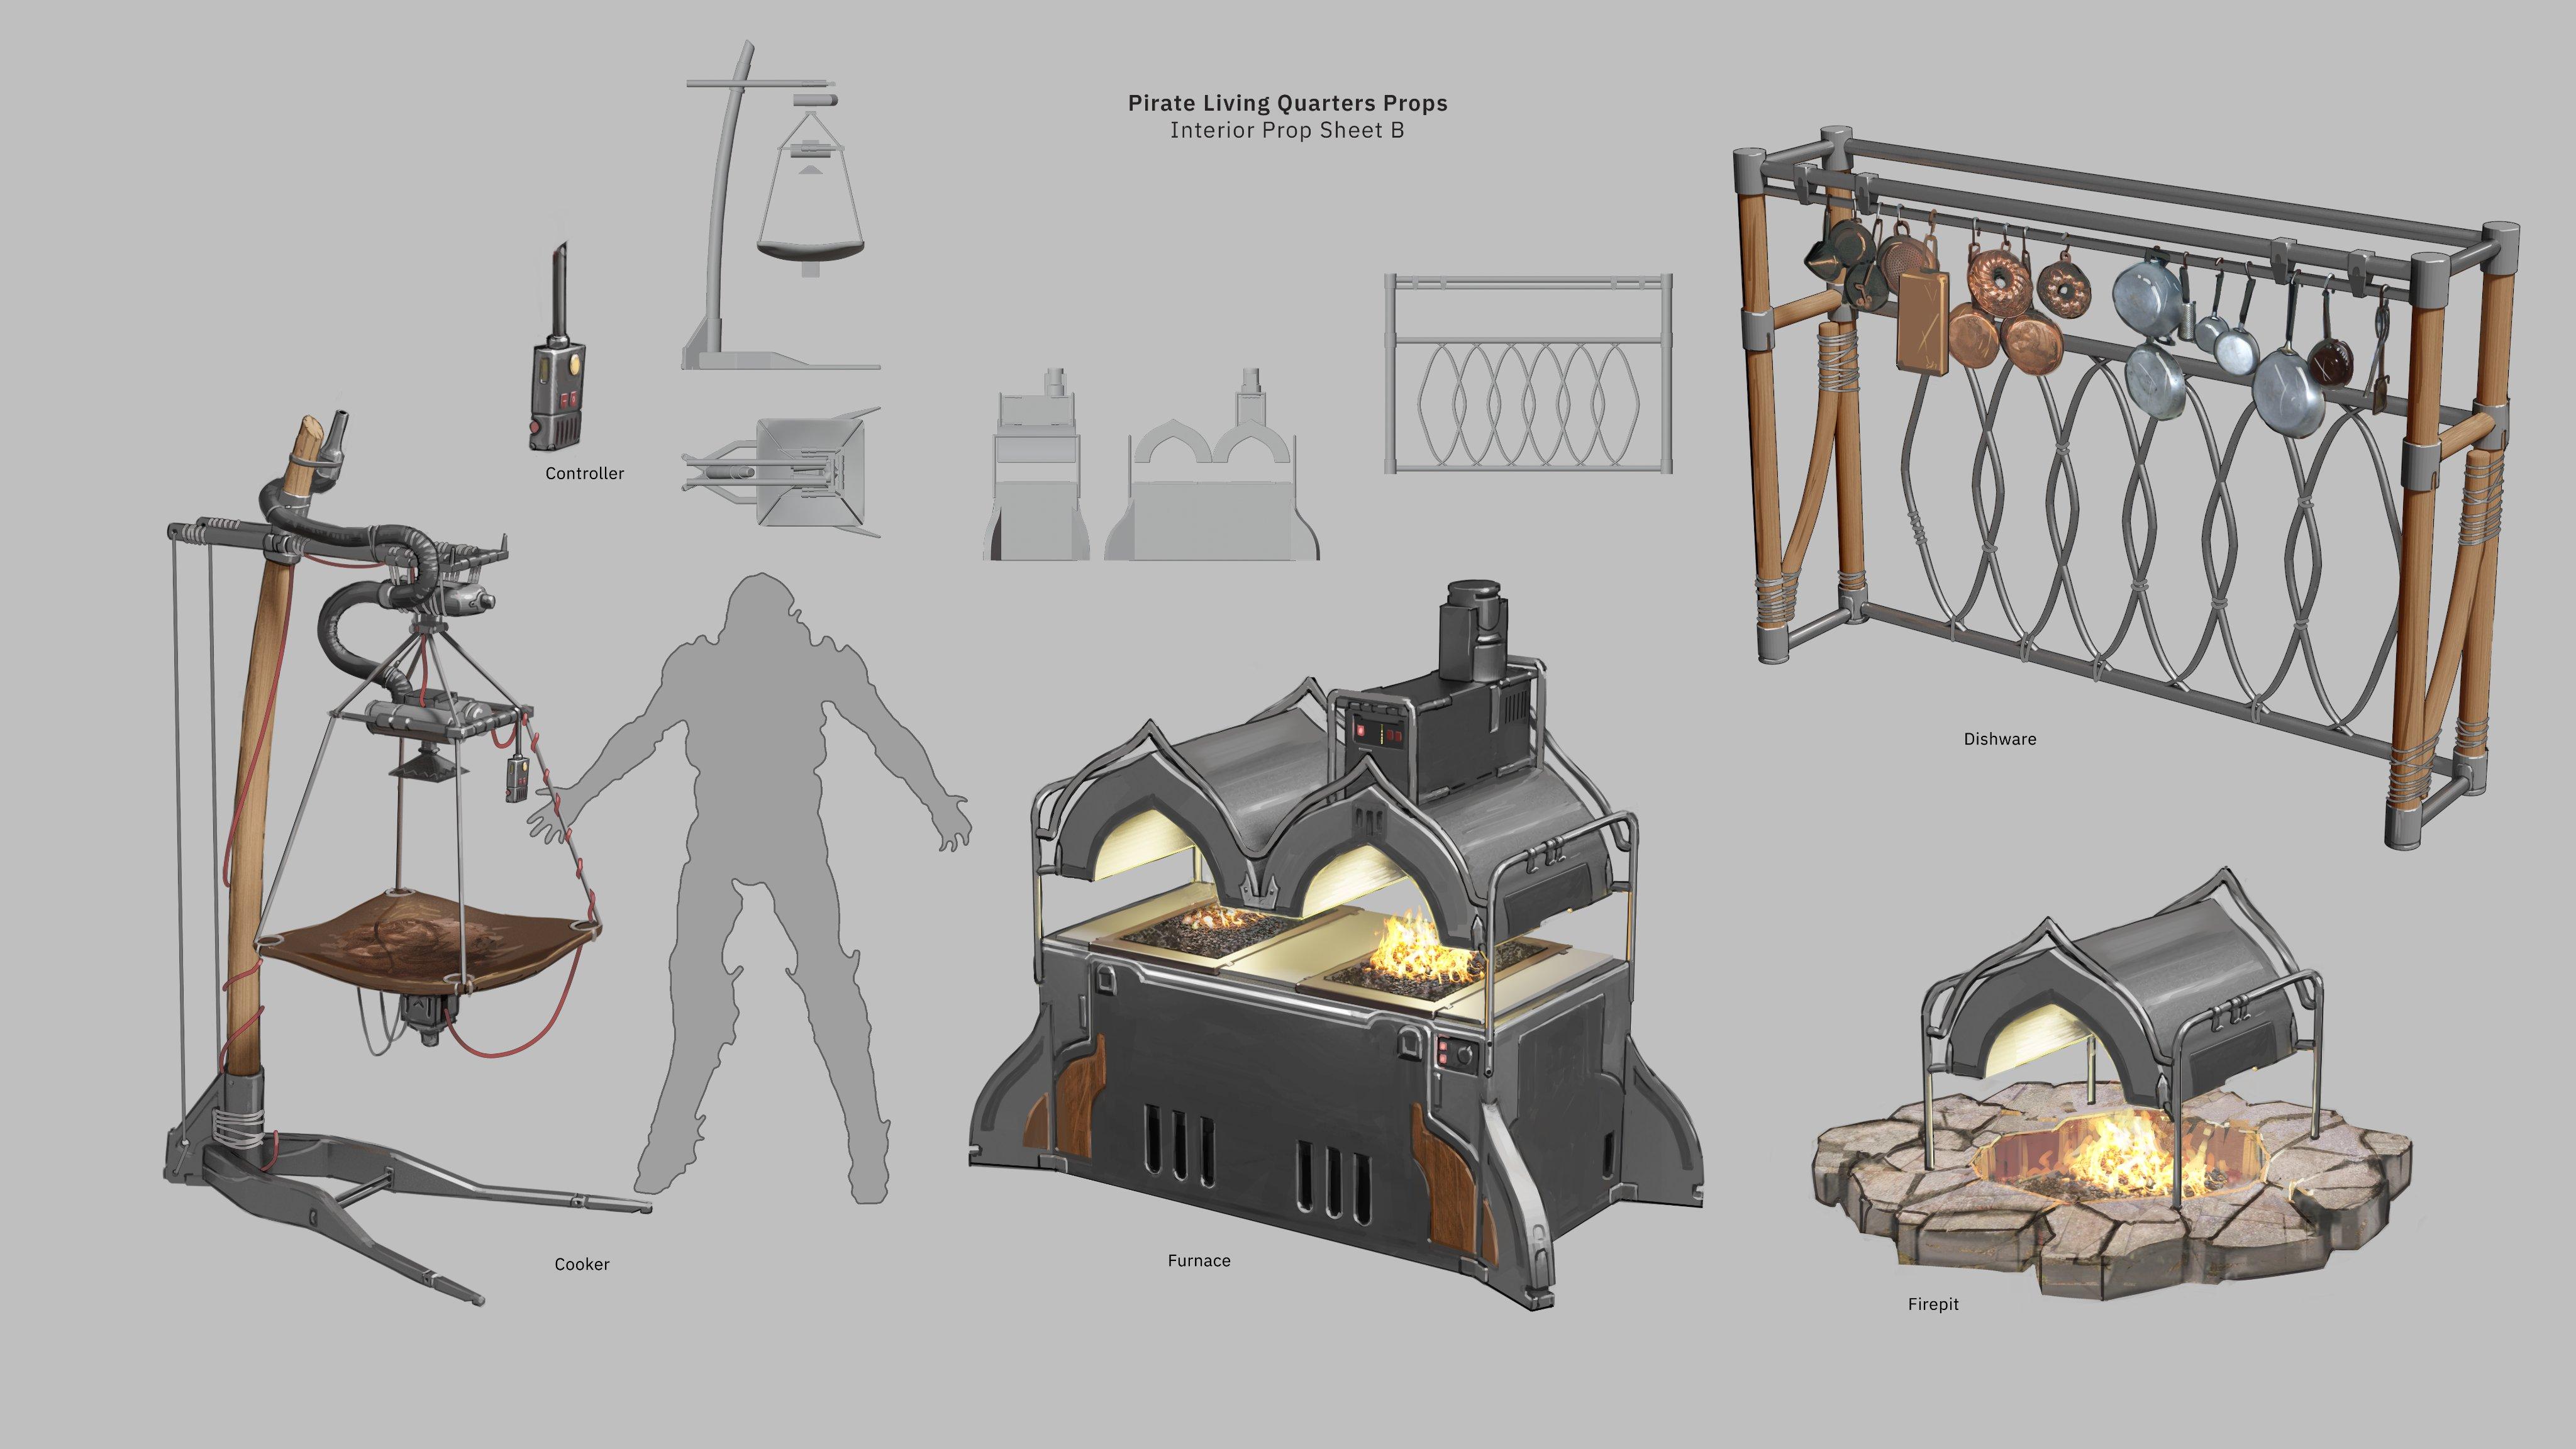 《圣歌2.0》新副本Longfall Ruins更多概念图展示